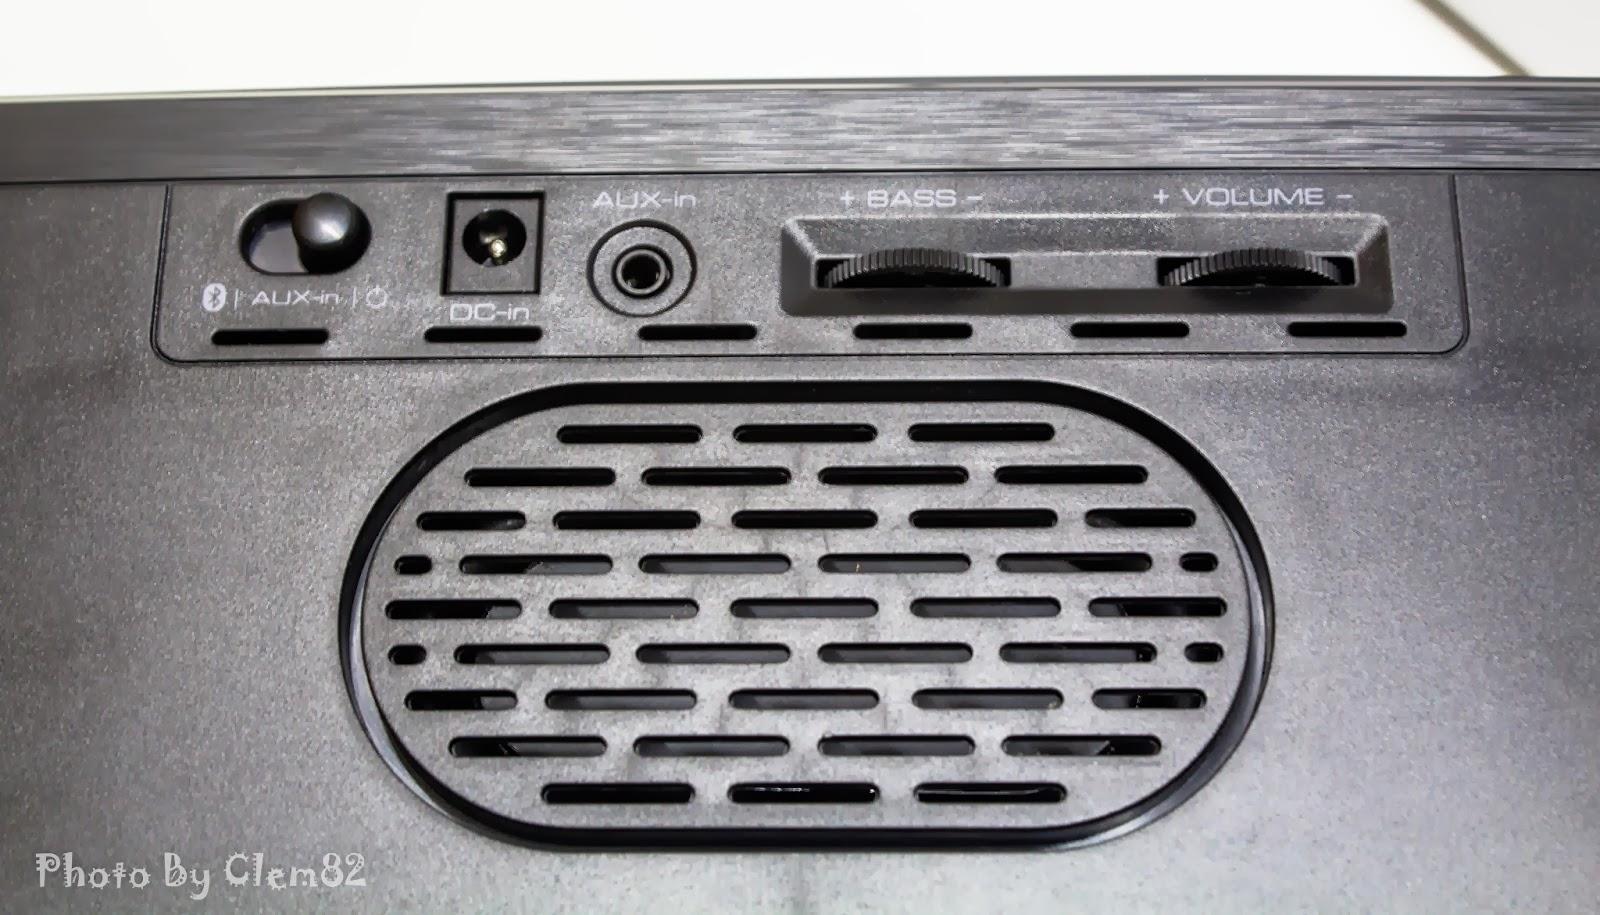 Opening Pandora's Box: SonicGear Pandora Wireless Bluetooth Media Player Series 25